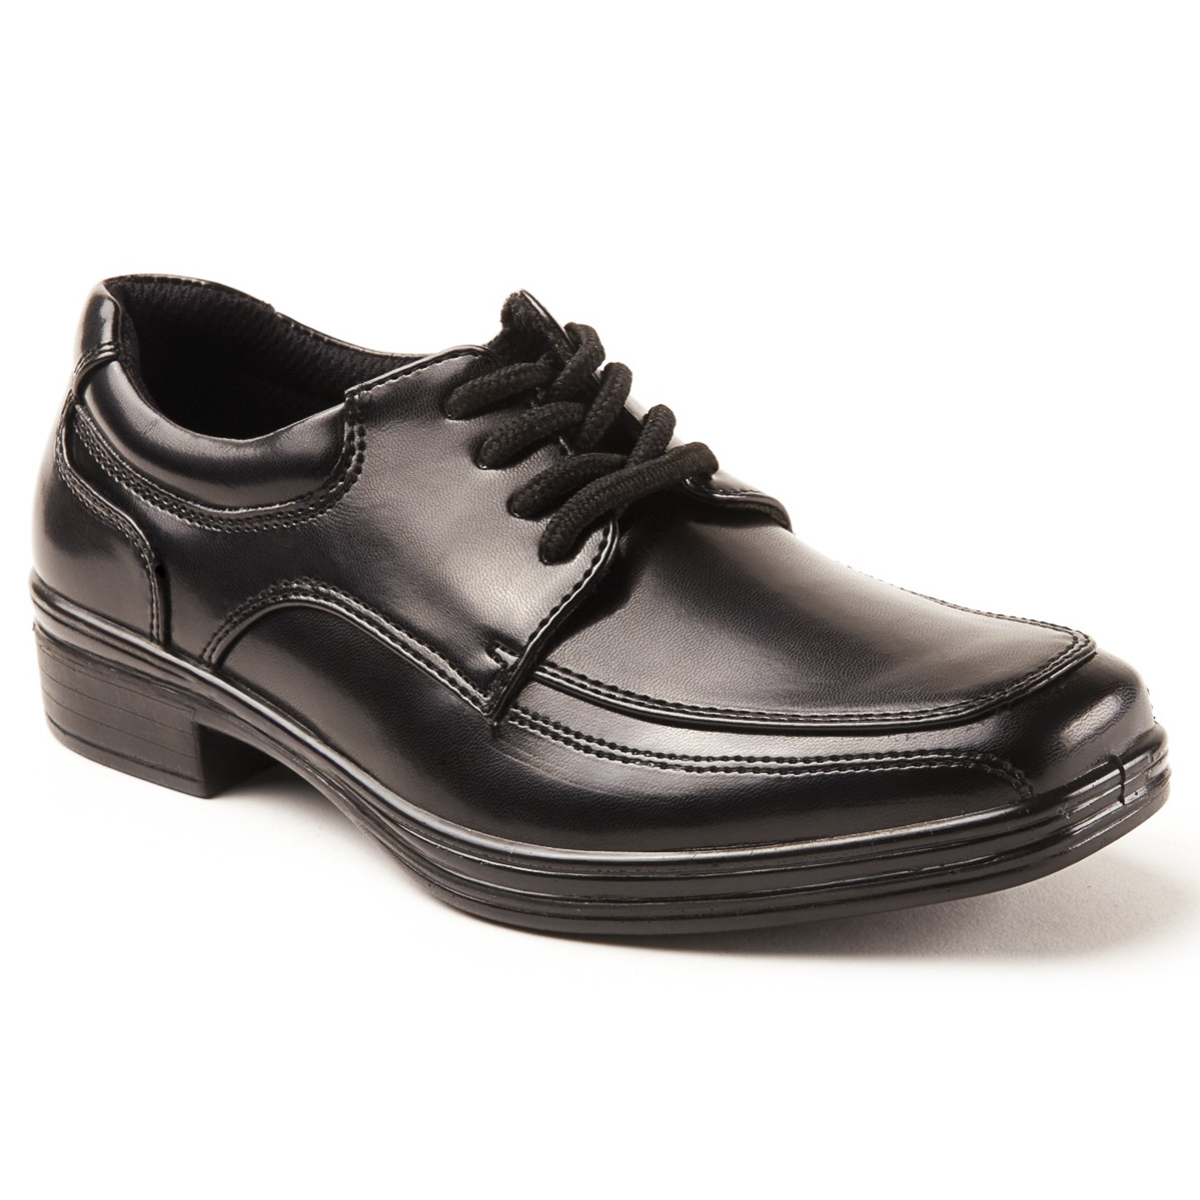 Deer Stags Boys' Sharp Shoe - Black, 3